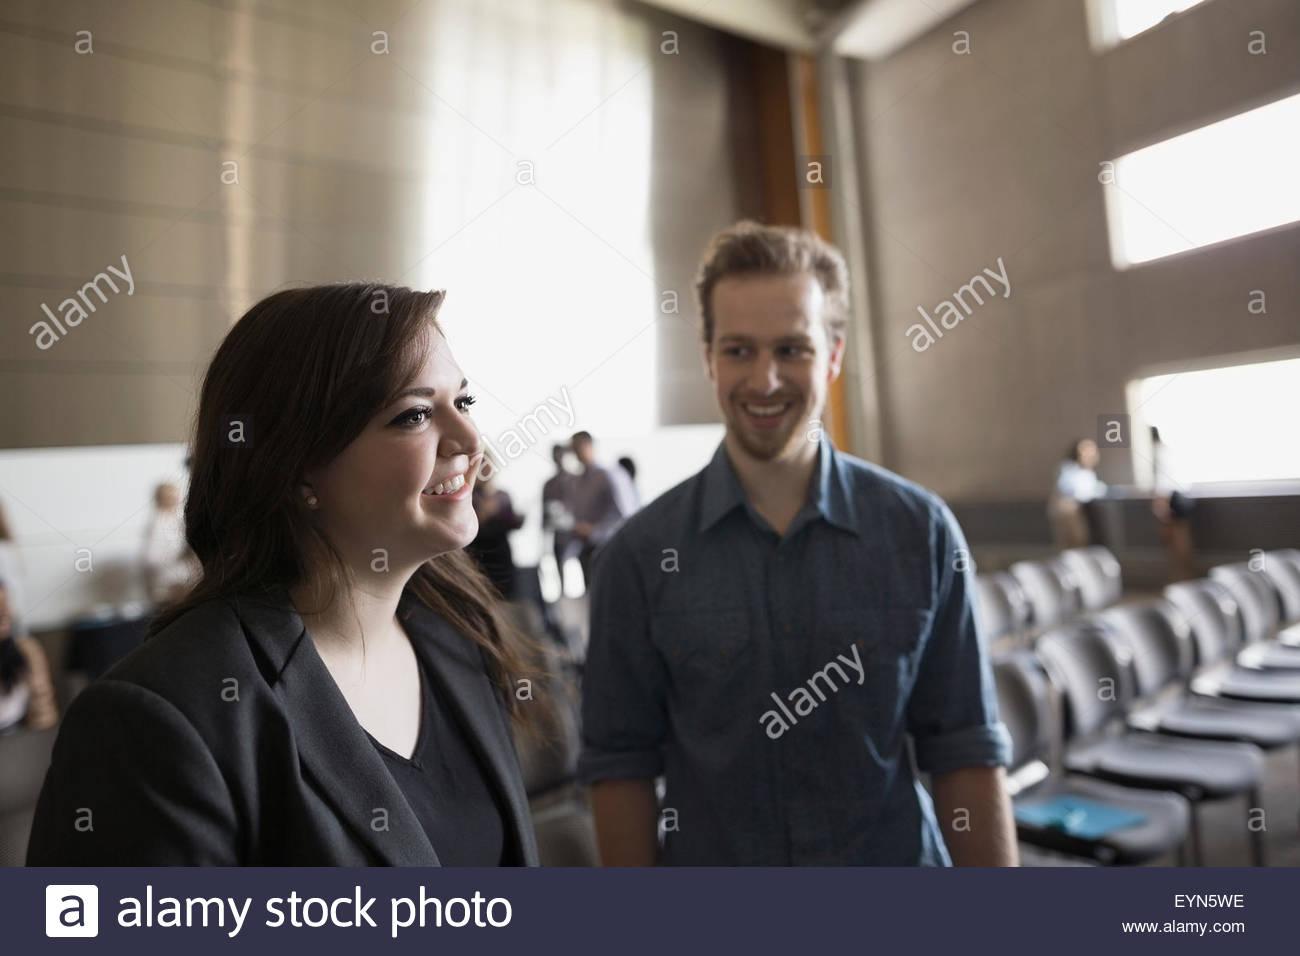 Smiling students in auditorium - Stock Image